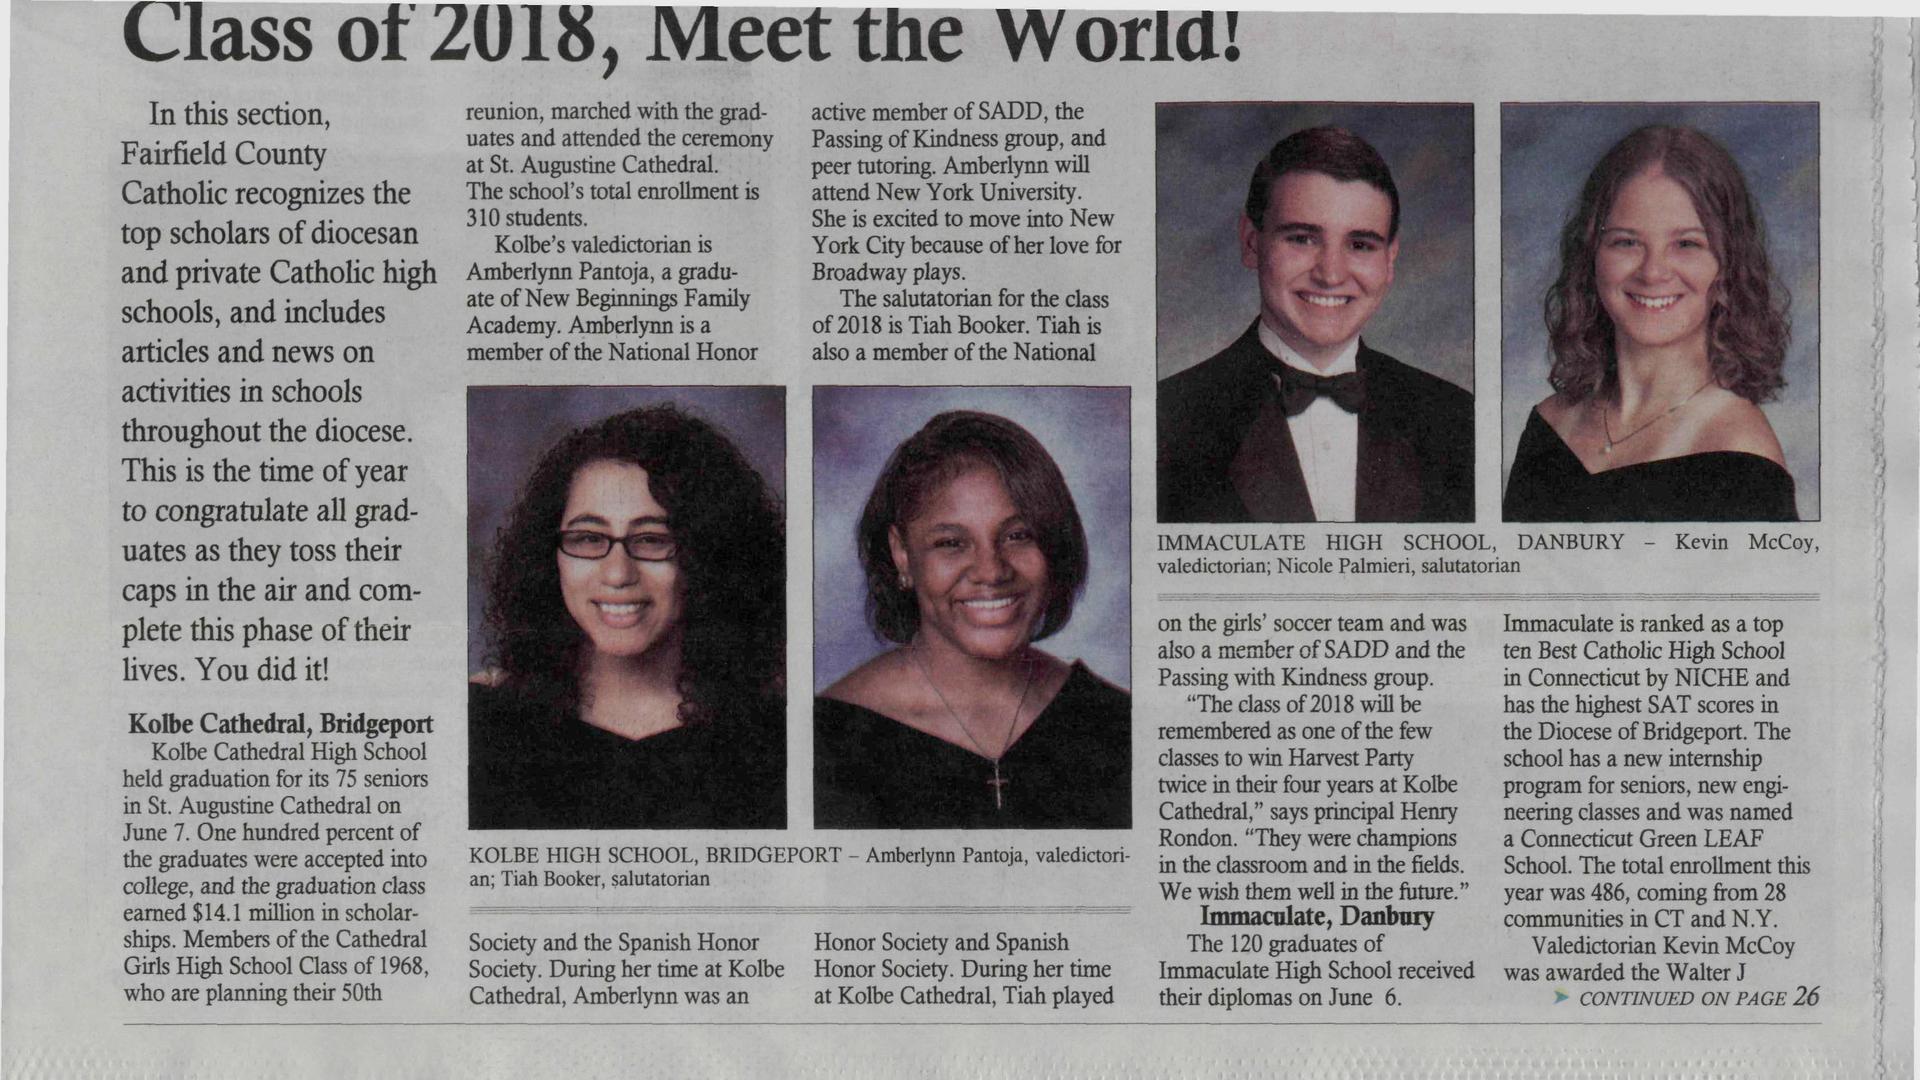 NBFA in the News – News – New Beginnings Family Academy